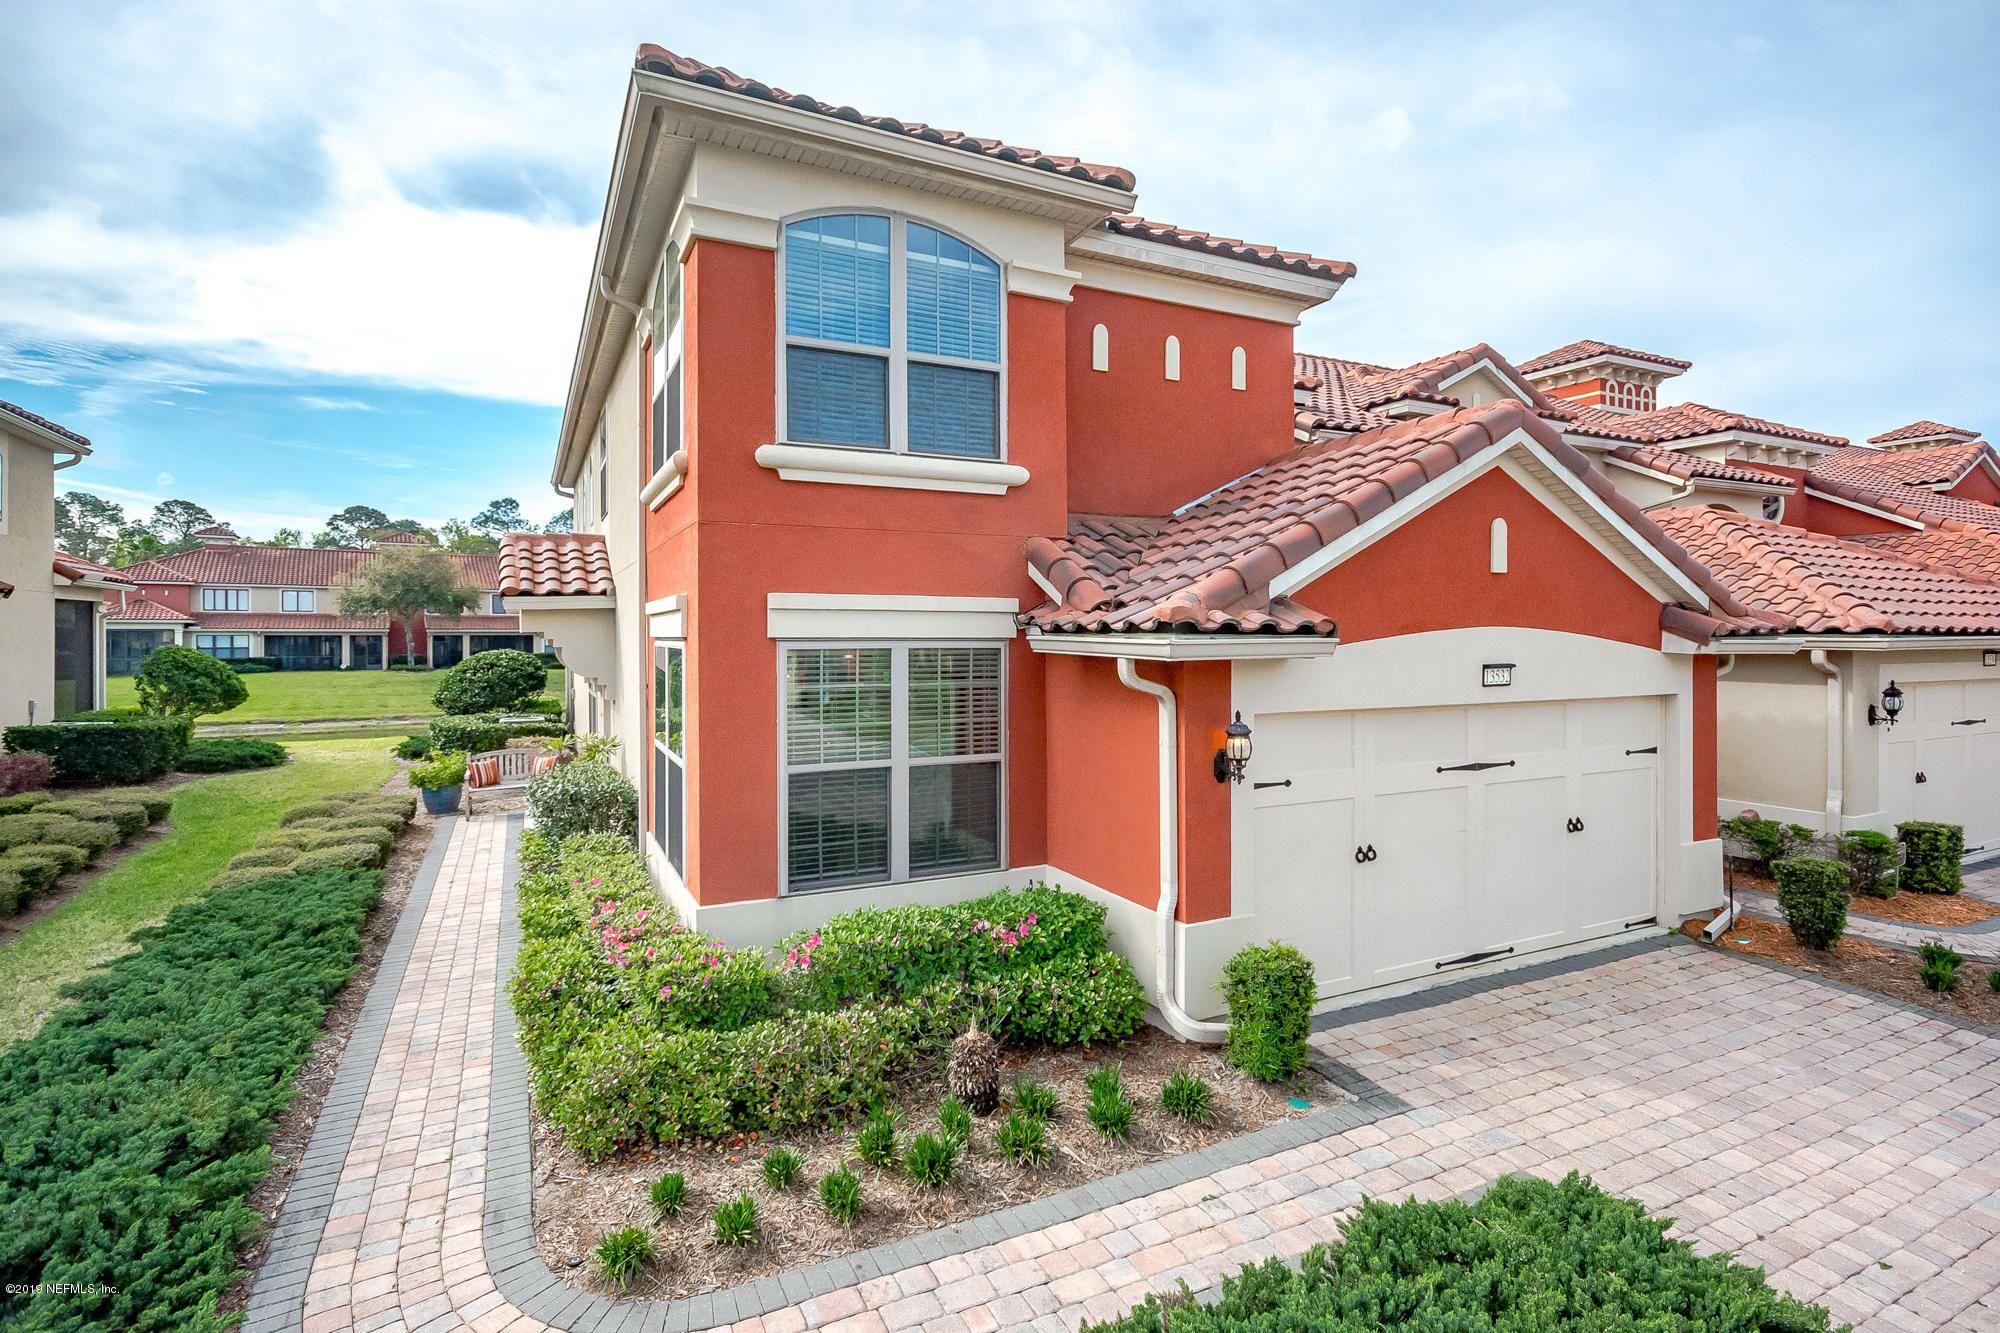 Awe Inspiring 13532 Montecito Pl Jacksonville Fl 32224 3 Bed 3 Bath Townhouse Mls 985709 37 Photos Trulia Interior Design Ideas Gentotryabchikinfo